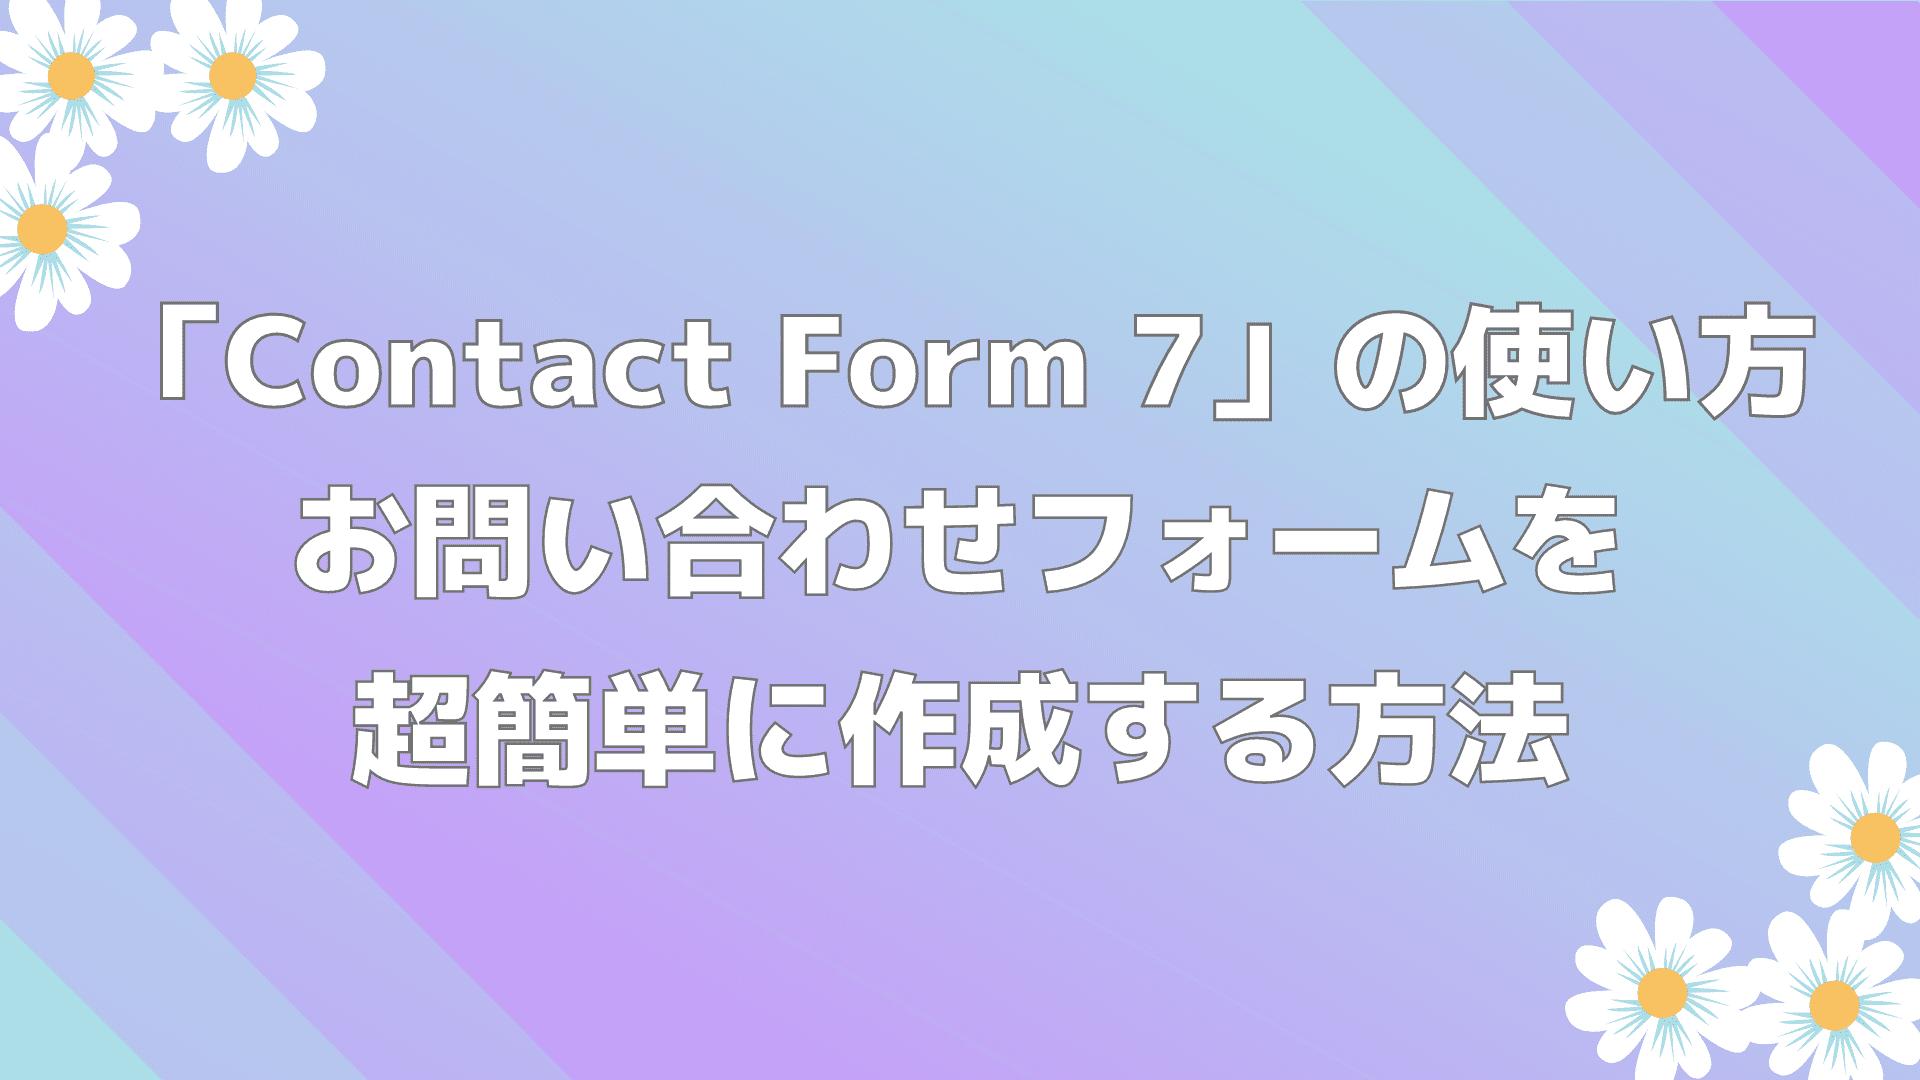 Contact Form 7の使い方 お問い合わせフォームを超簡単に作成する方法